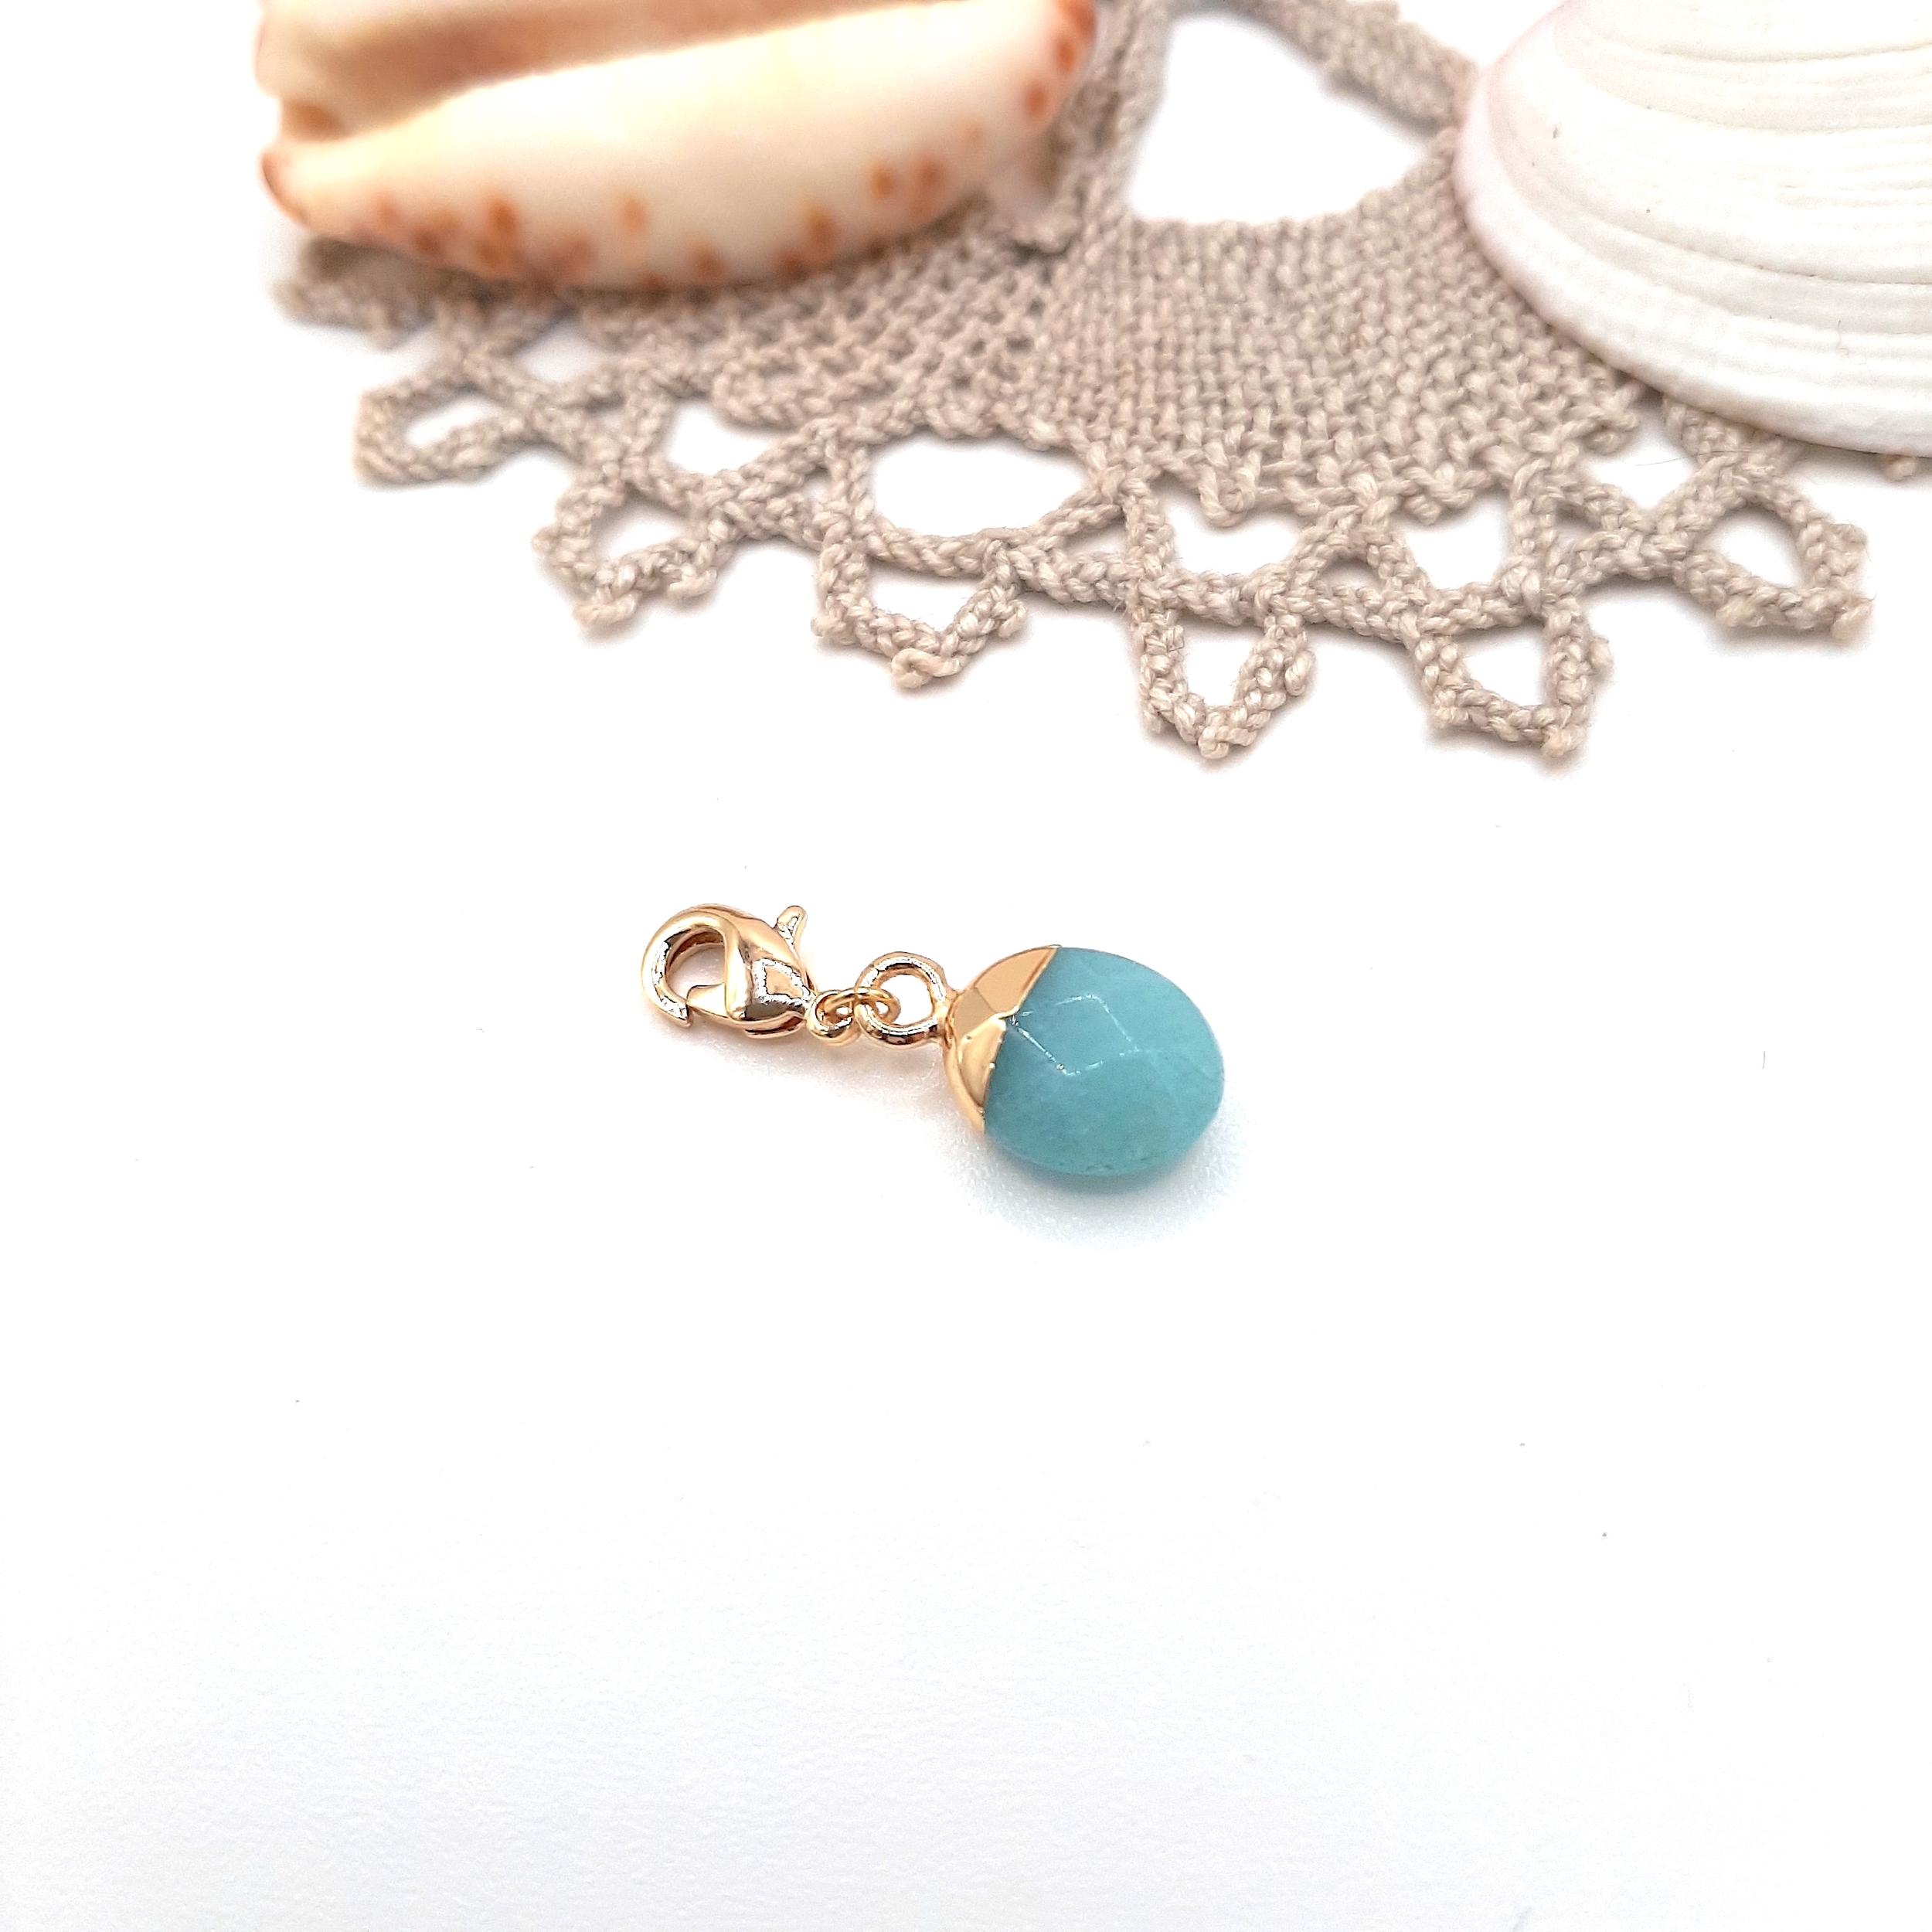 Clip - Pierre Turquoise